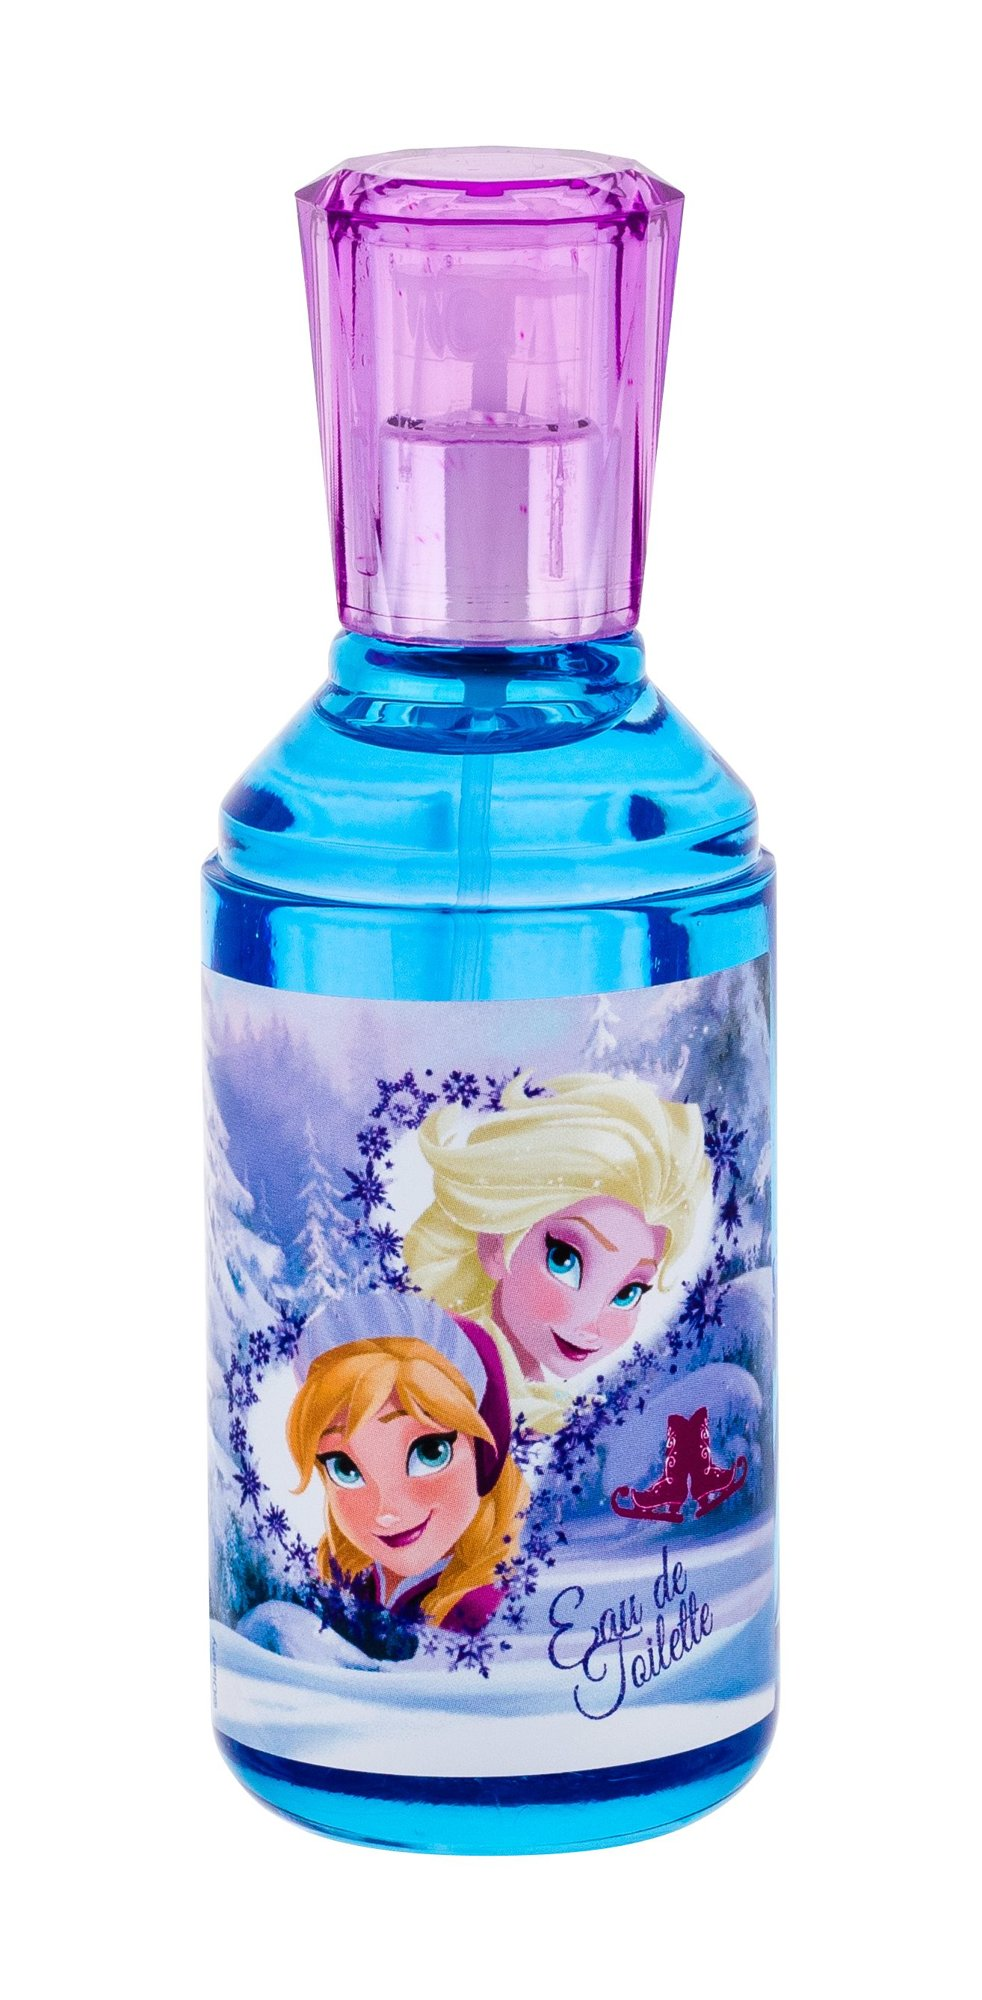 Disney Frozen Elsa Eau de Toilette 50ml